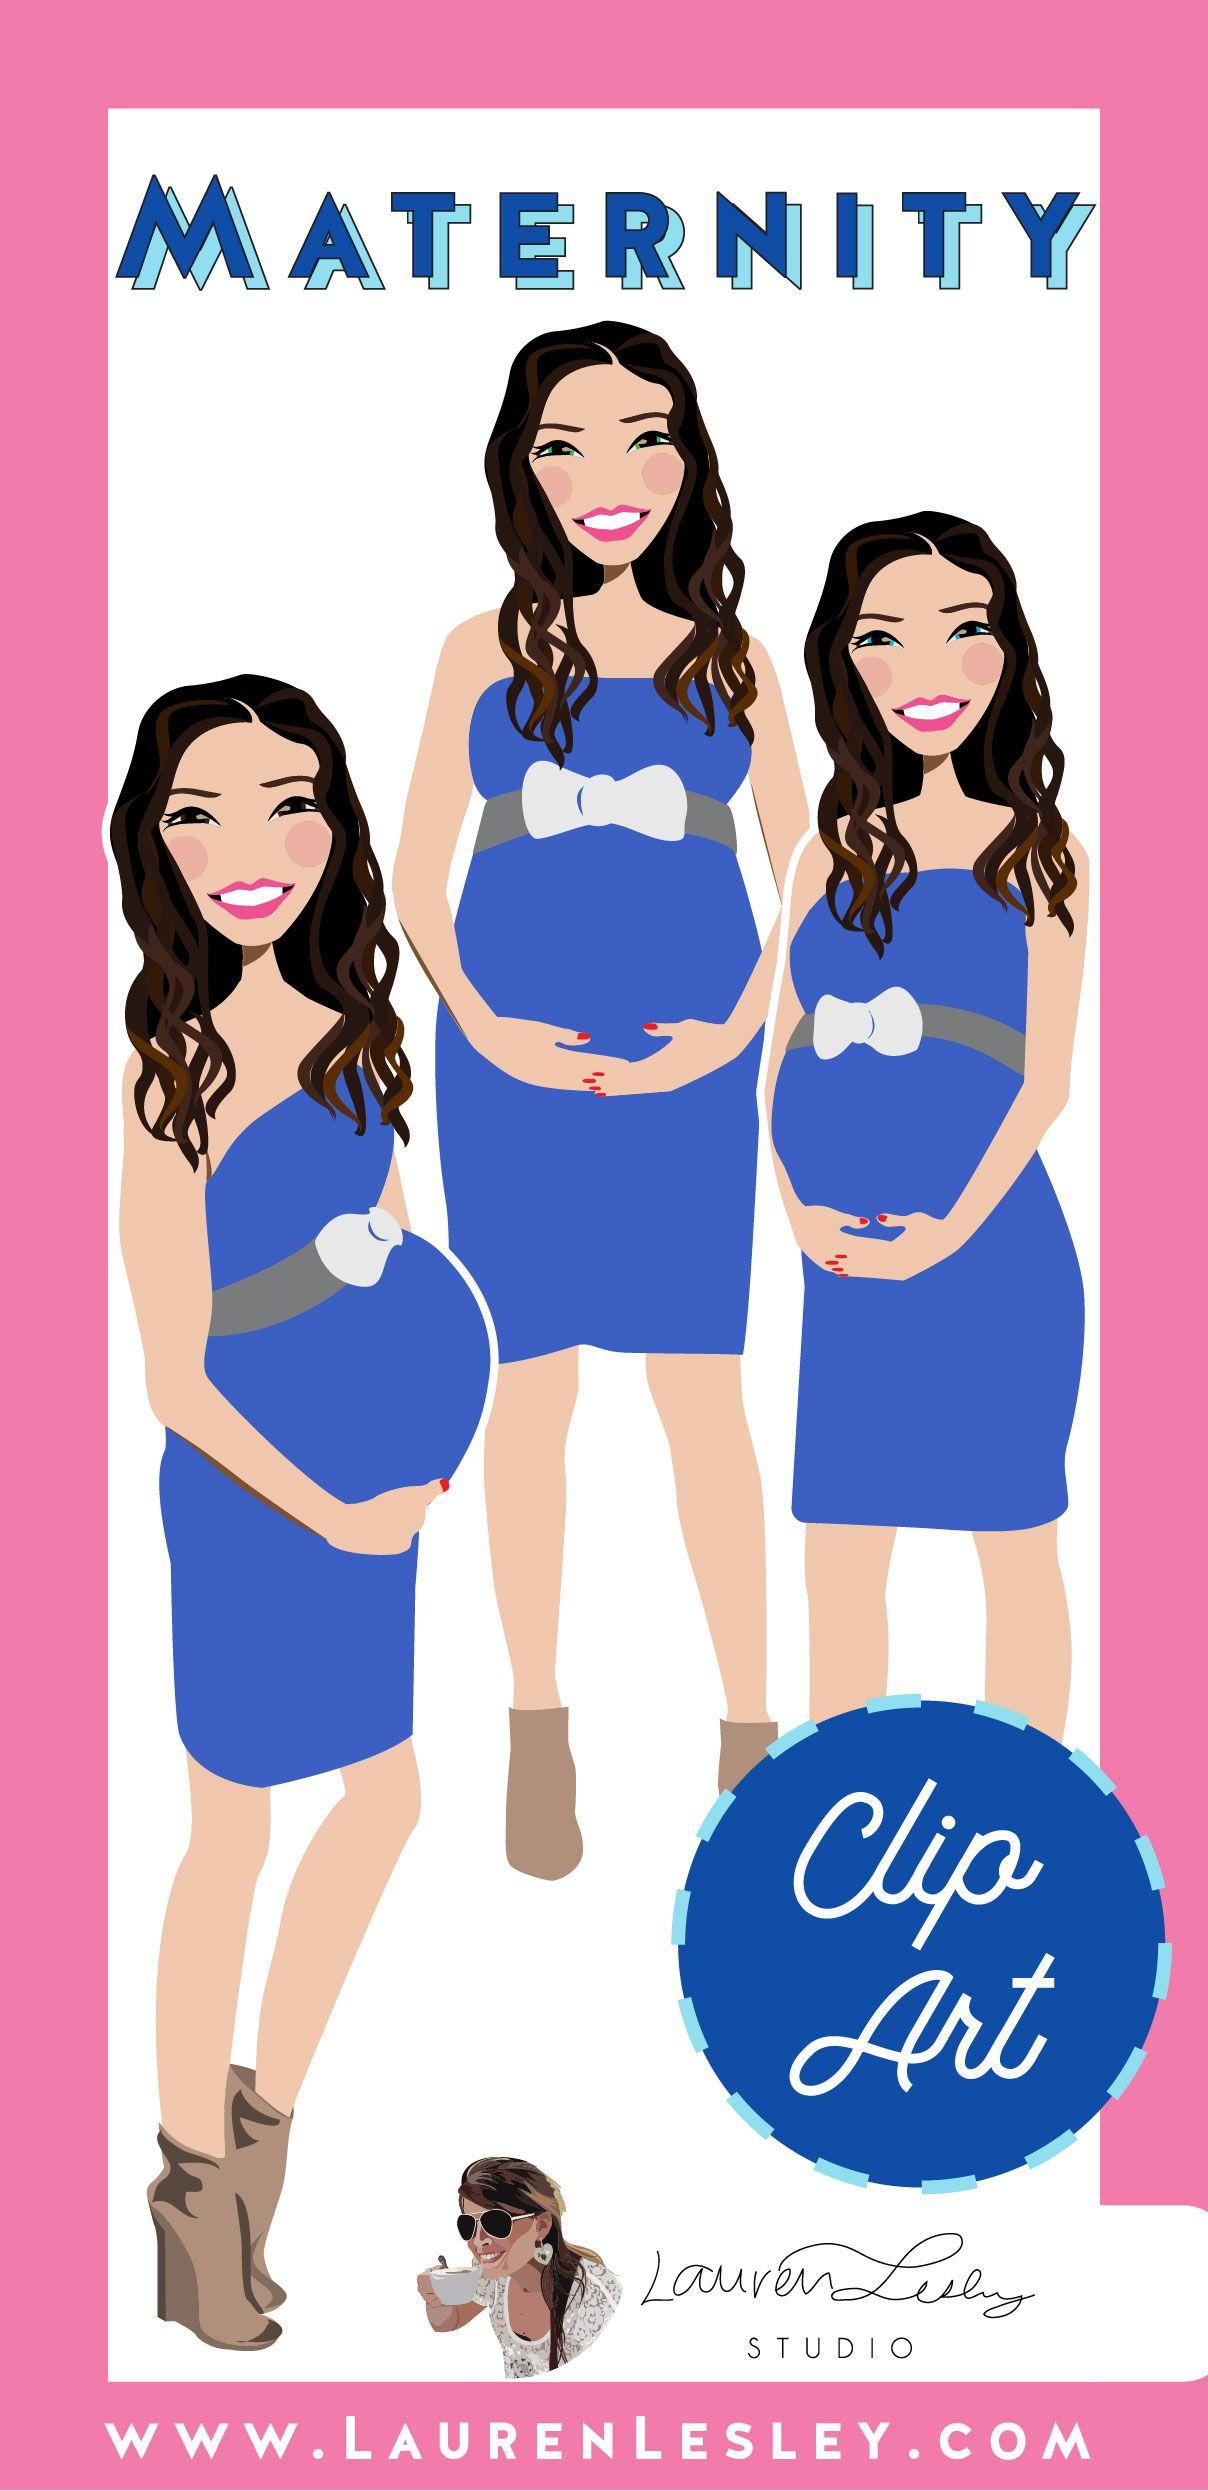 Maternity Clip Art Xioli Clip art, Maternity